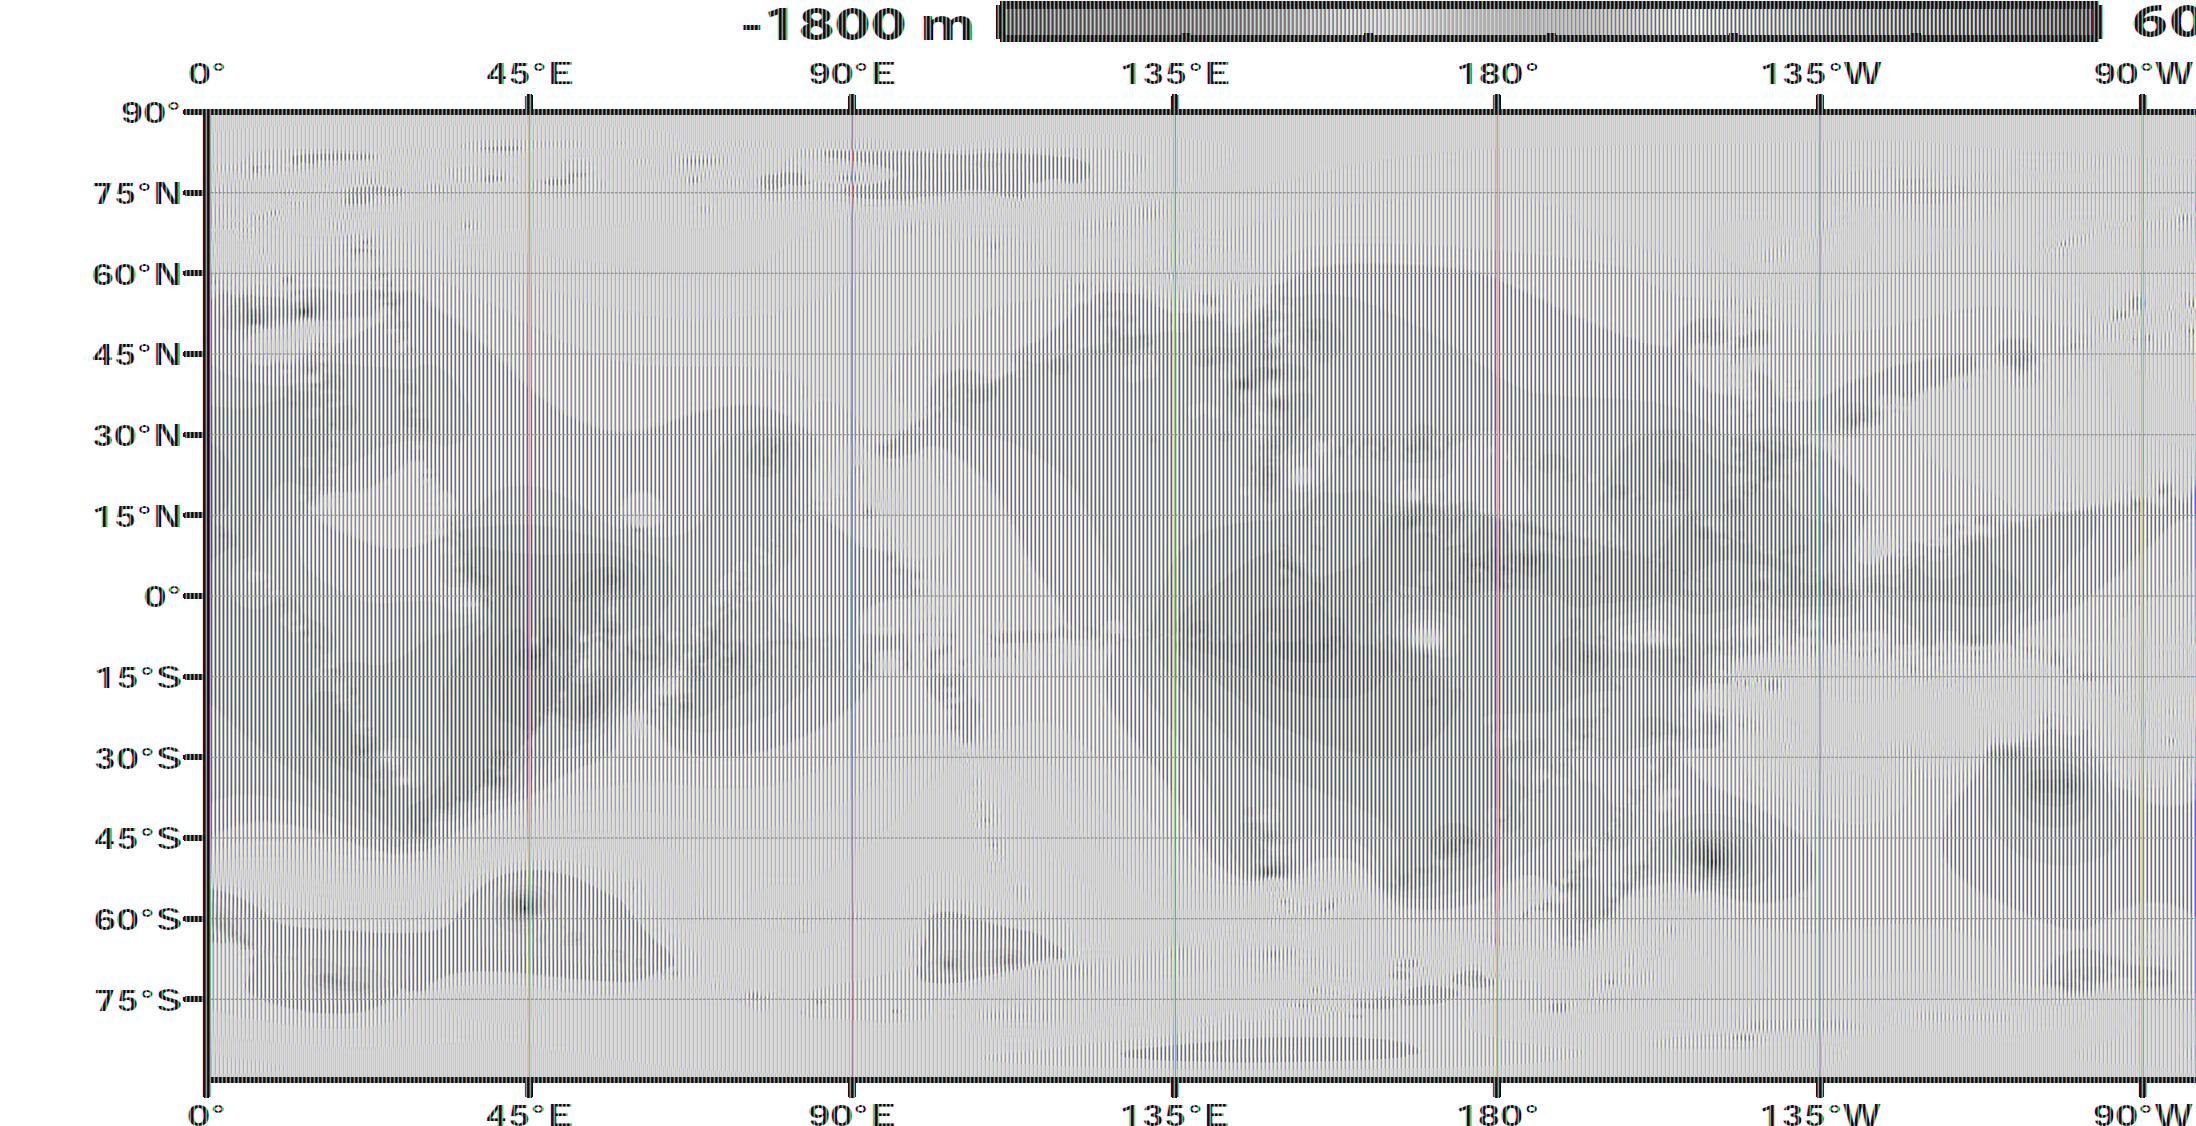 saturn planet elevation maps - photo #17